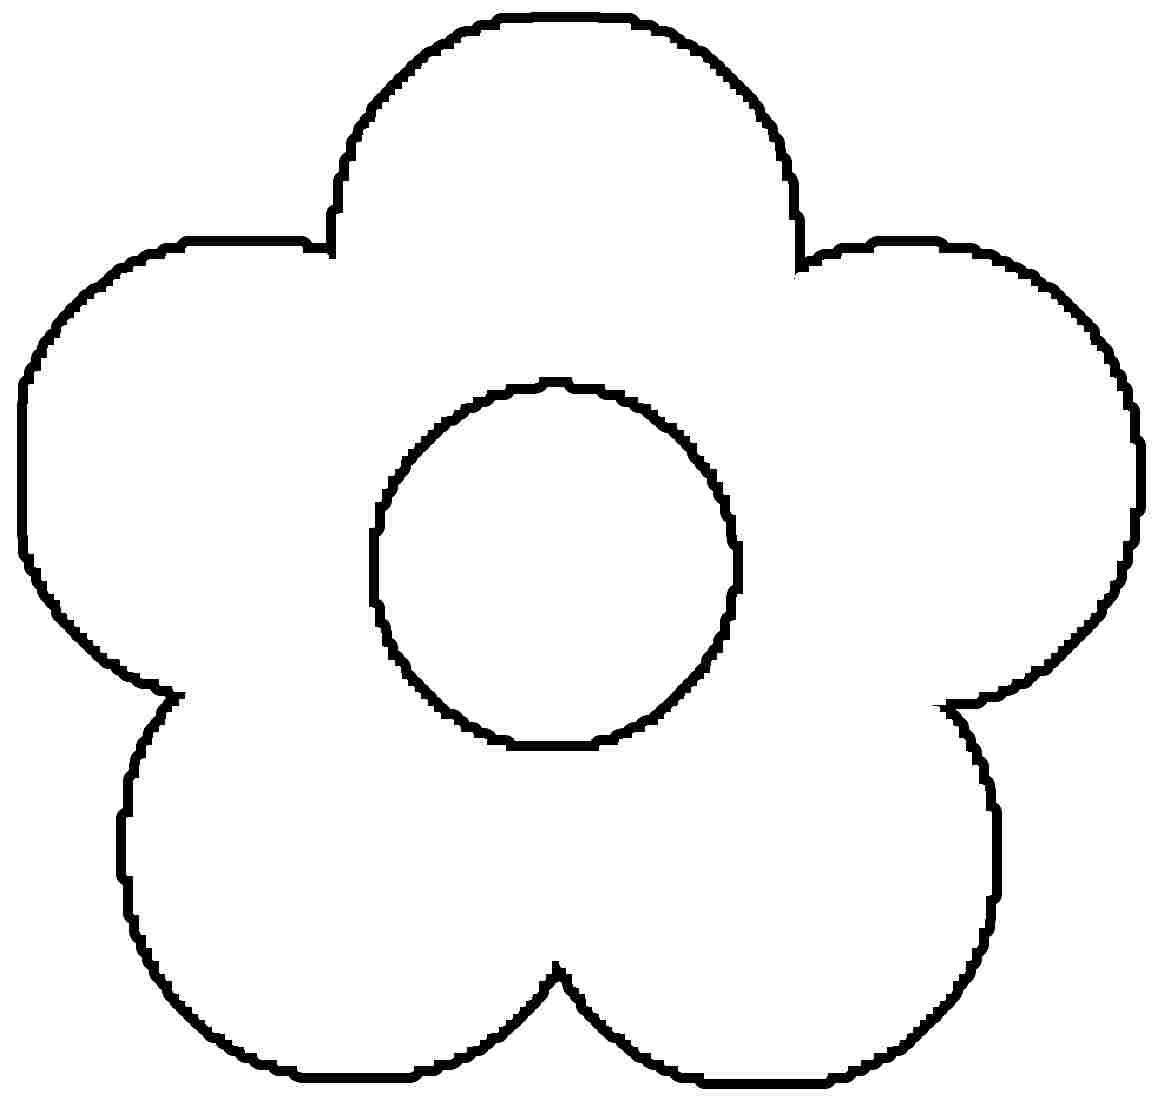 Coloring Sheets Preschool | Flower coloring pages ... | flower coloring pages preschool